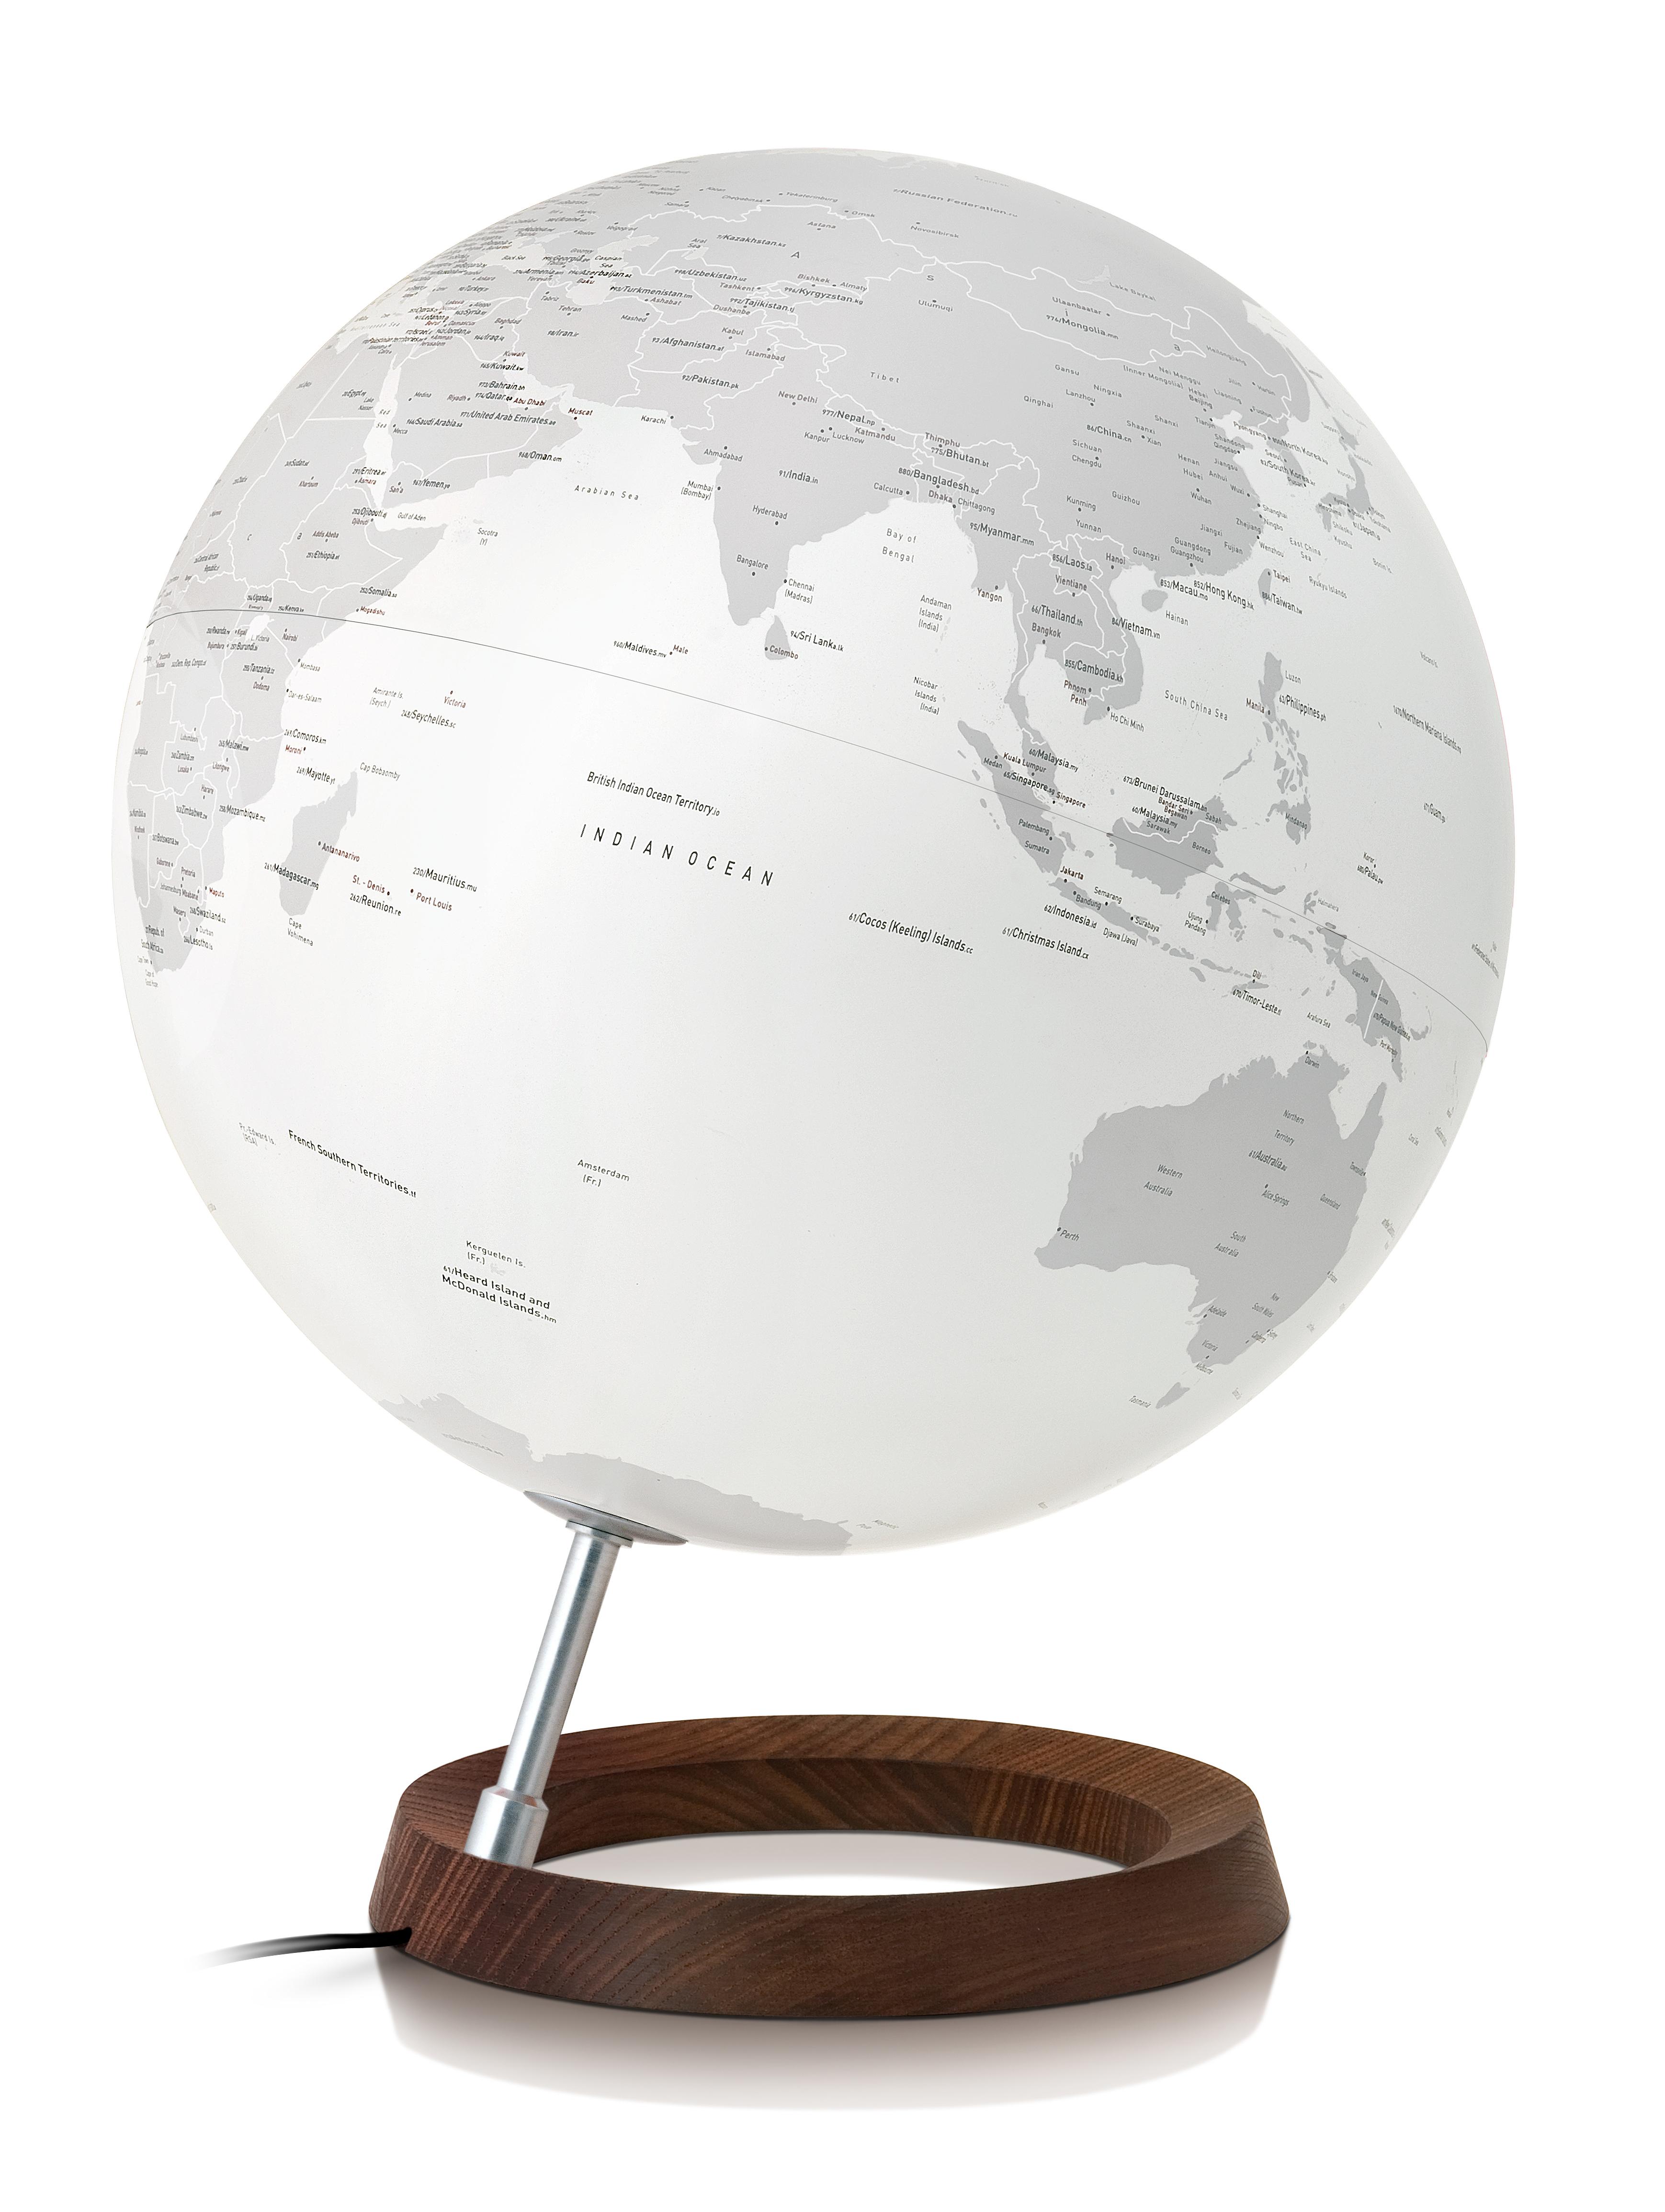 FC REFLETION - Globe terrestre de design, lumineux, textes en anglais